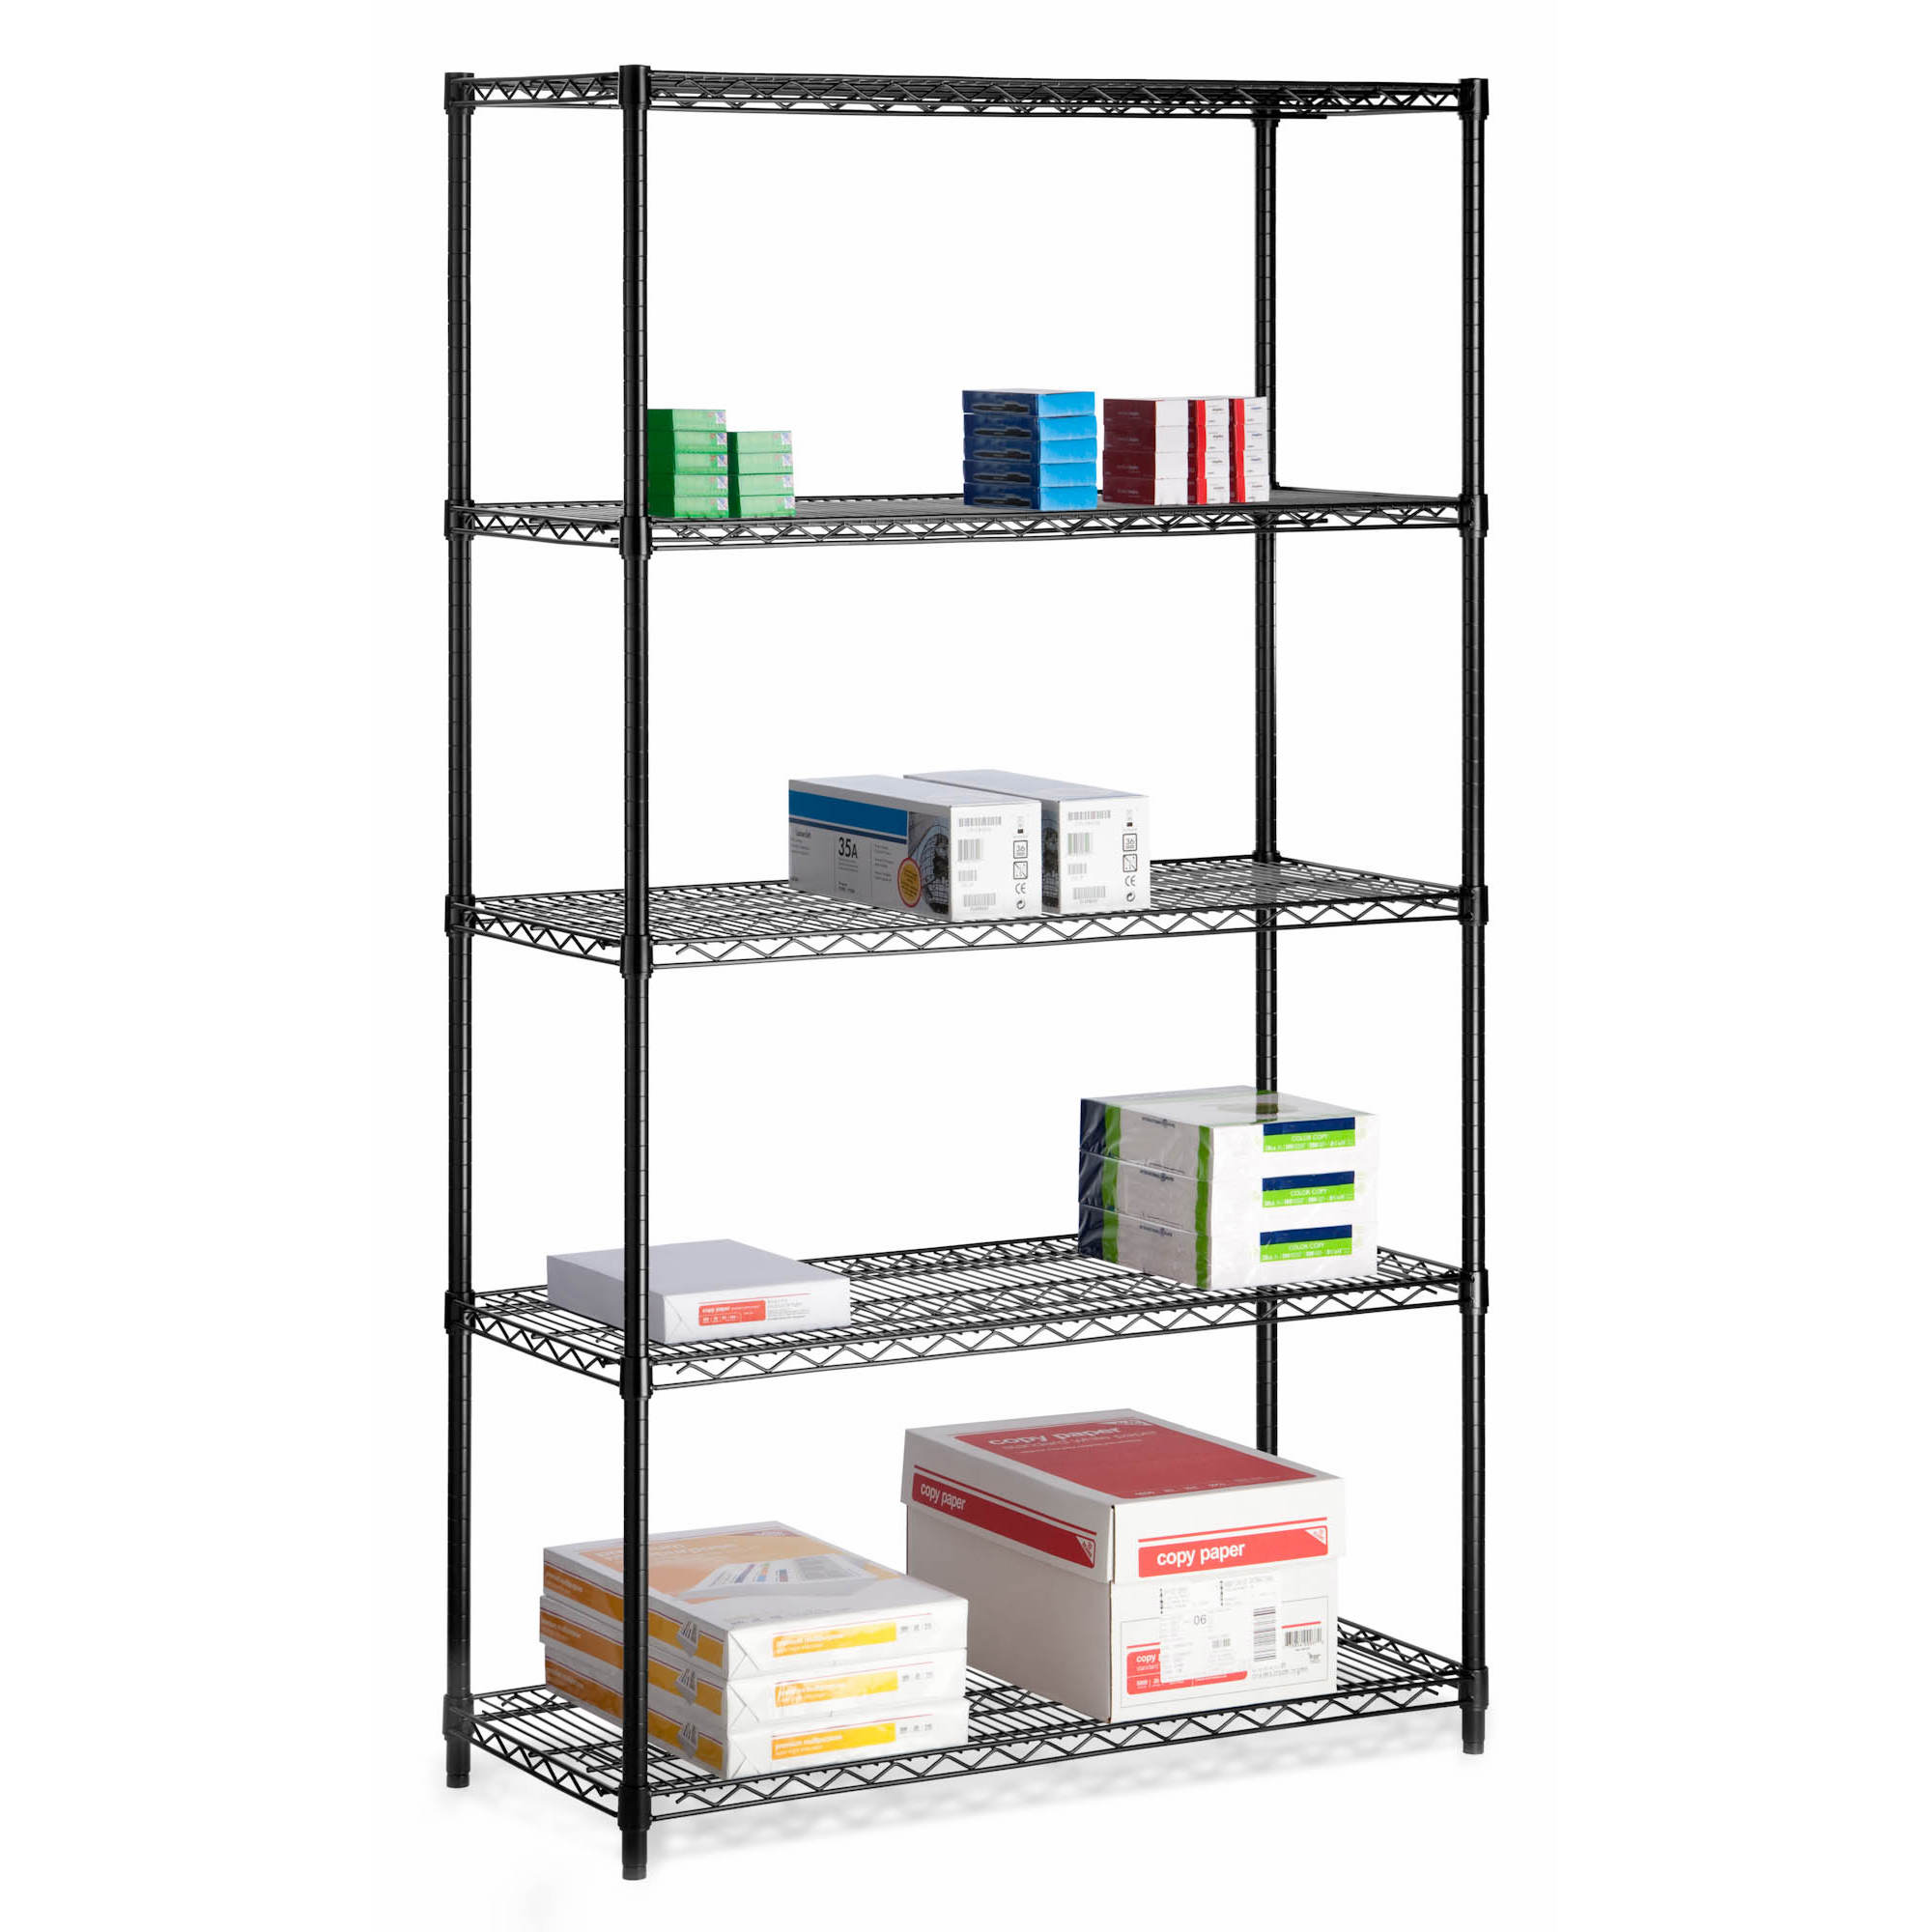 storage eket ikea combination option white with s legs expedit shelf norn cabinet djworx vinyl new kallax shelves